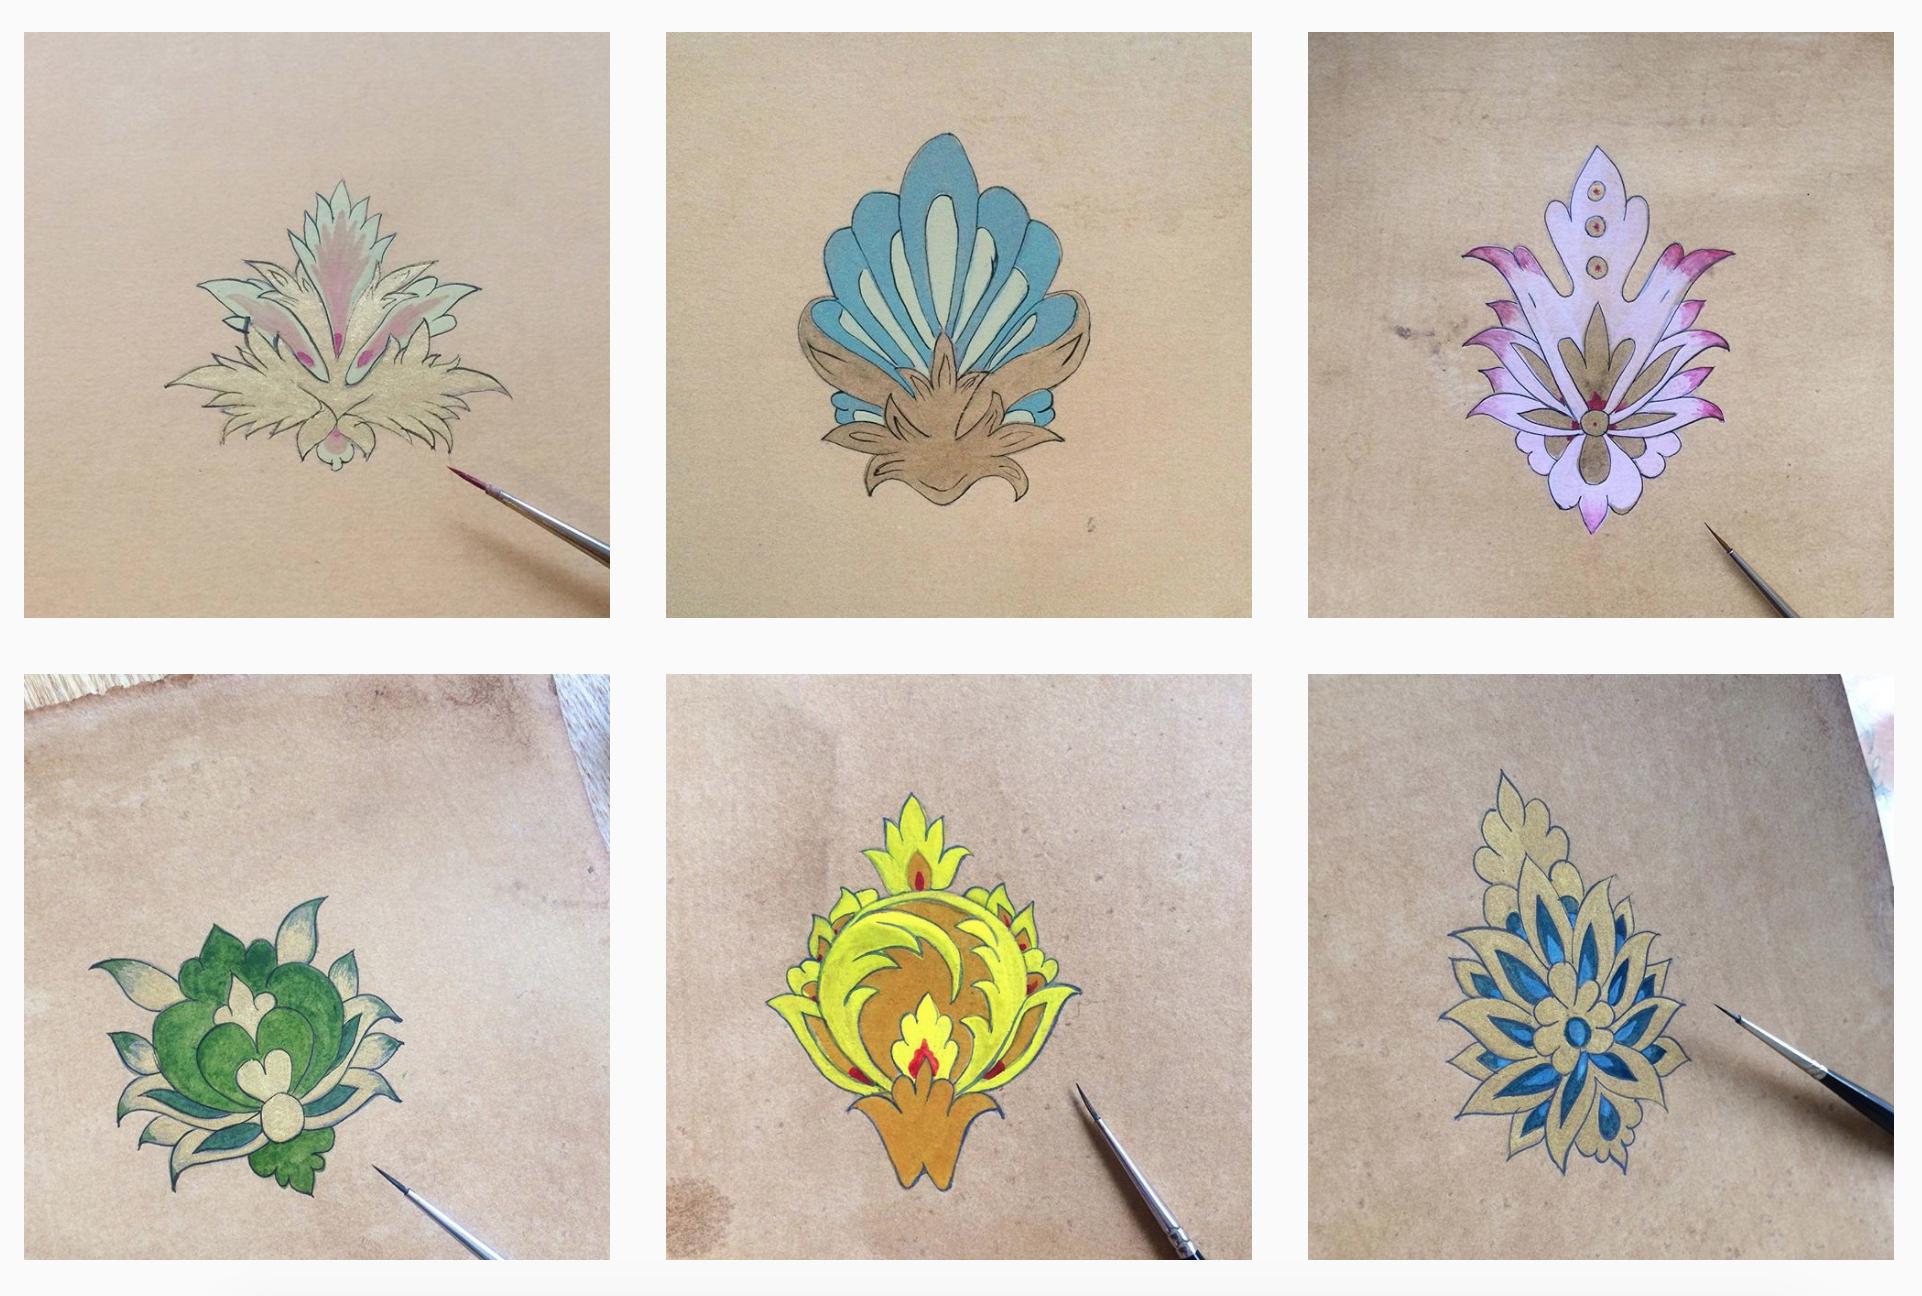 Golden Flower March Art Challengeتحدي الوردة الذهبية الفني مارس